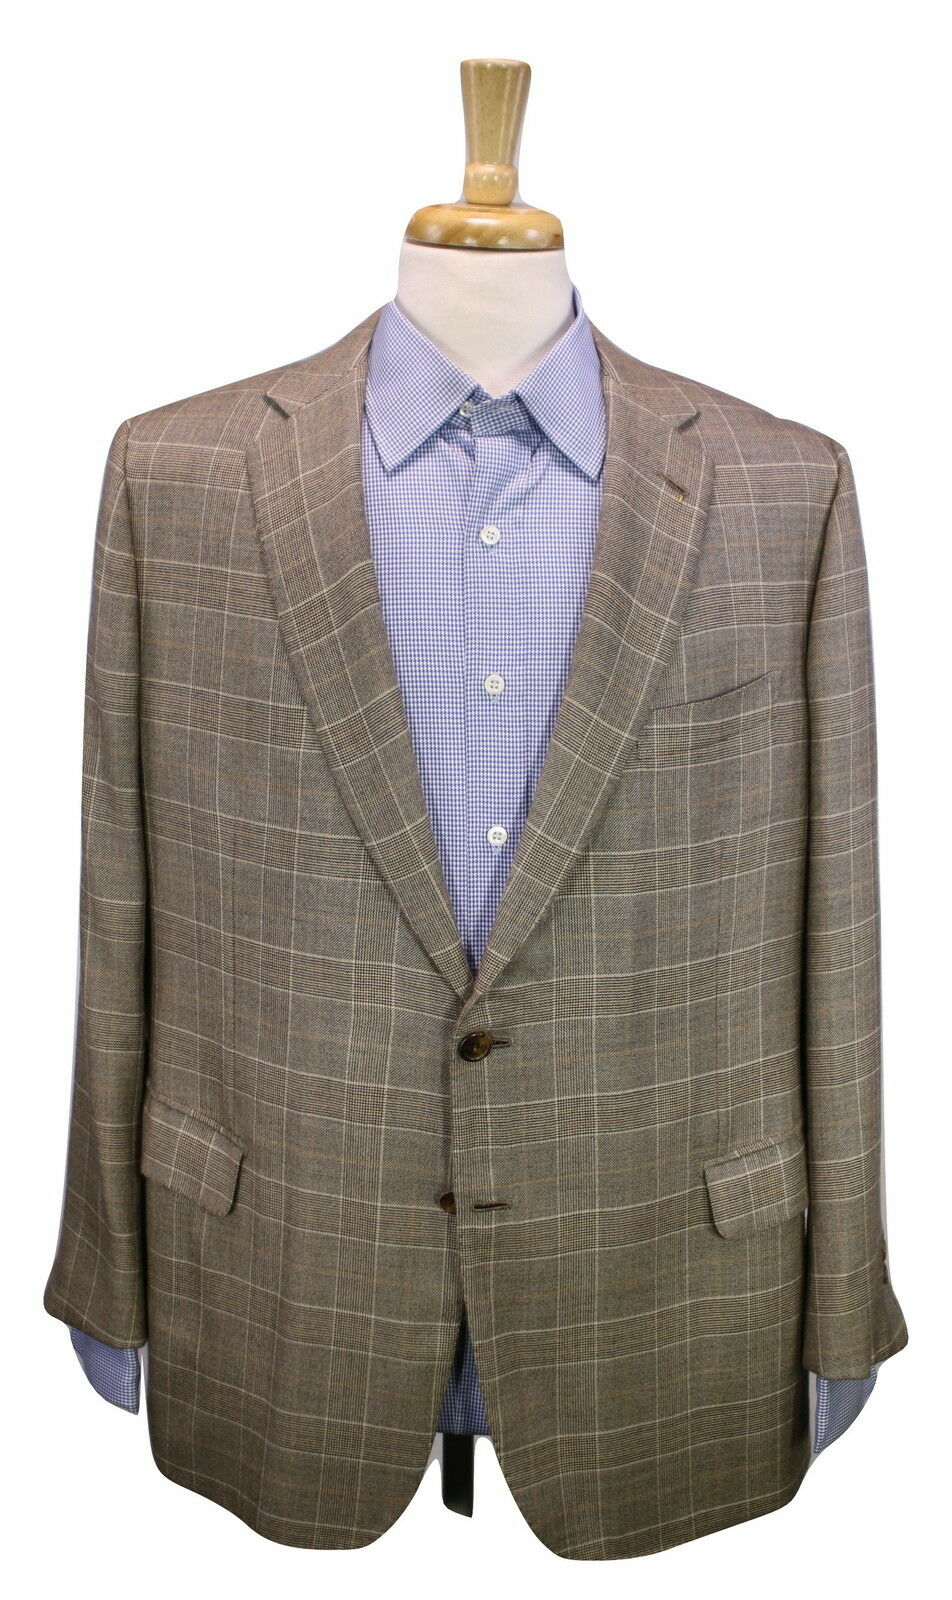 BRIONI  Recent Brown gold Plaid 100% Cashmere 2-Btn Sportcoat Blazer 42S